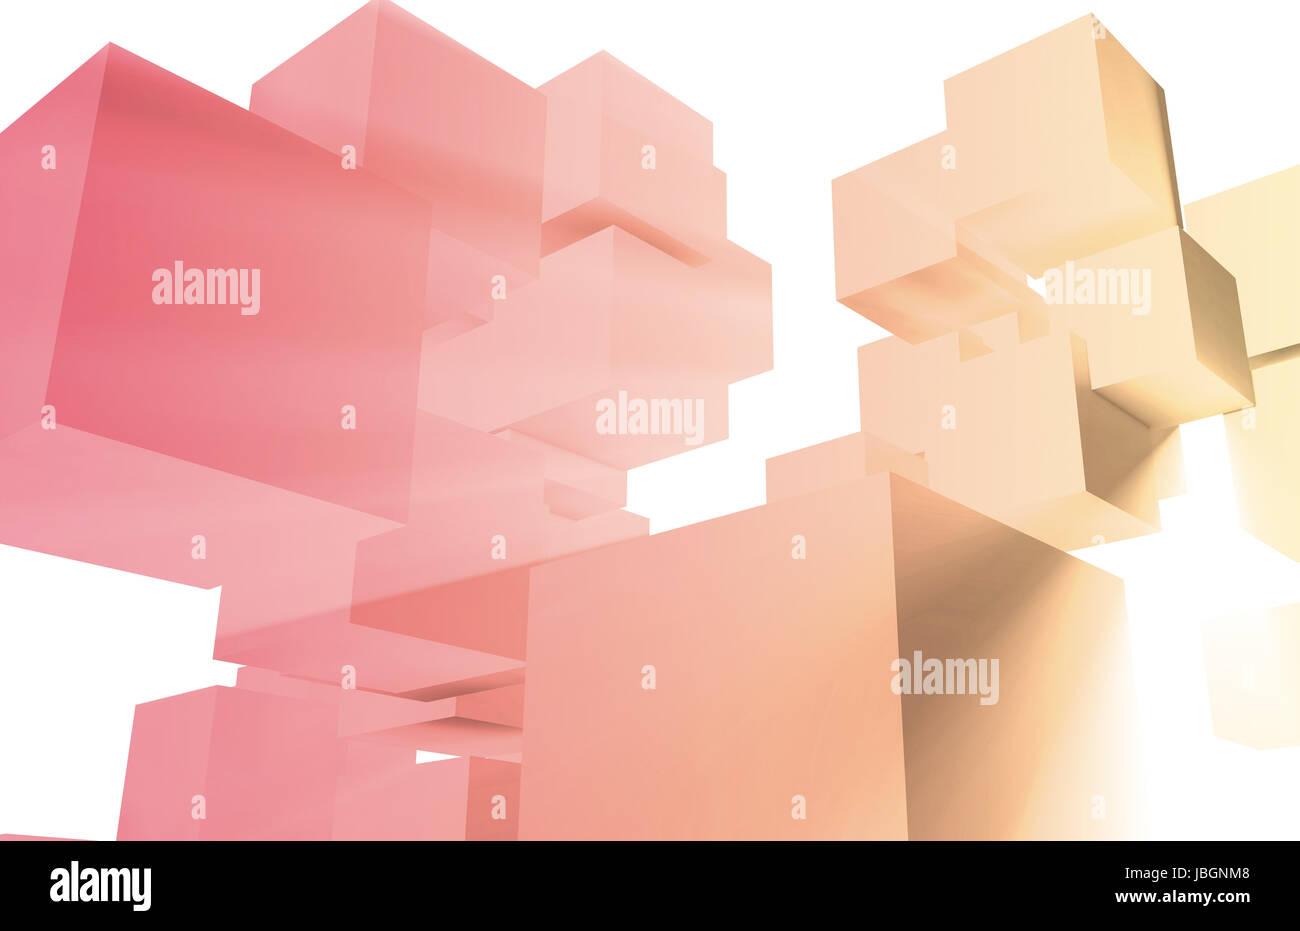 Evolving Technology Evolution as a Background Art - Stock Image